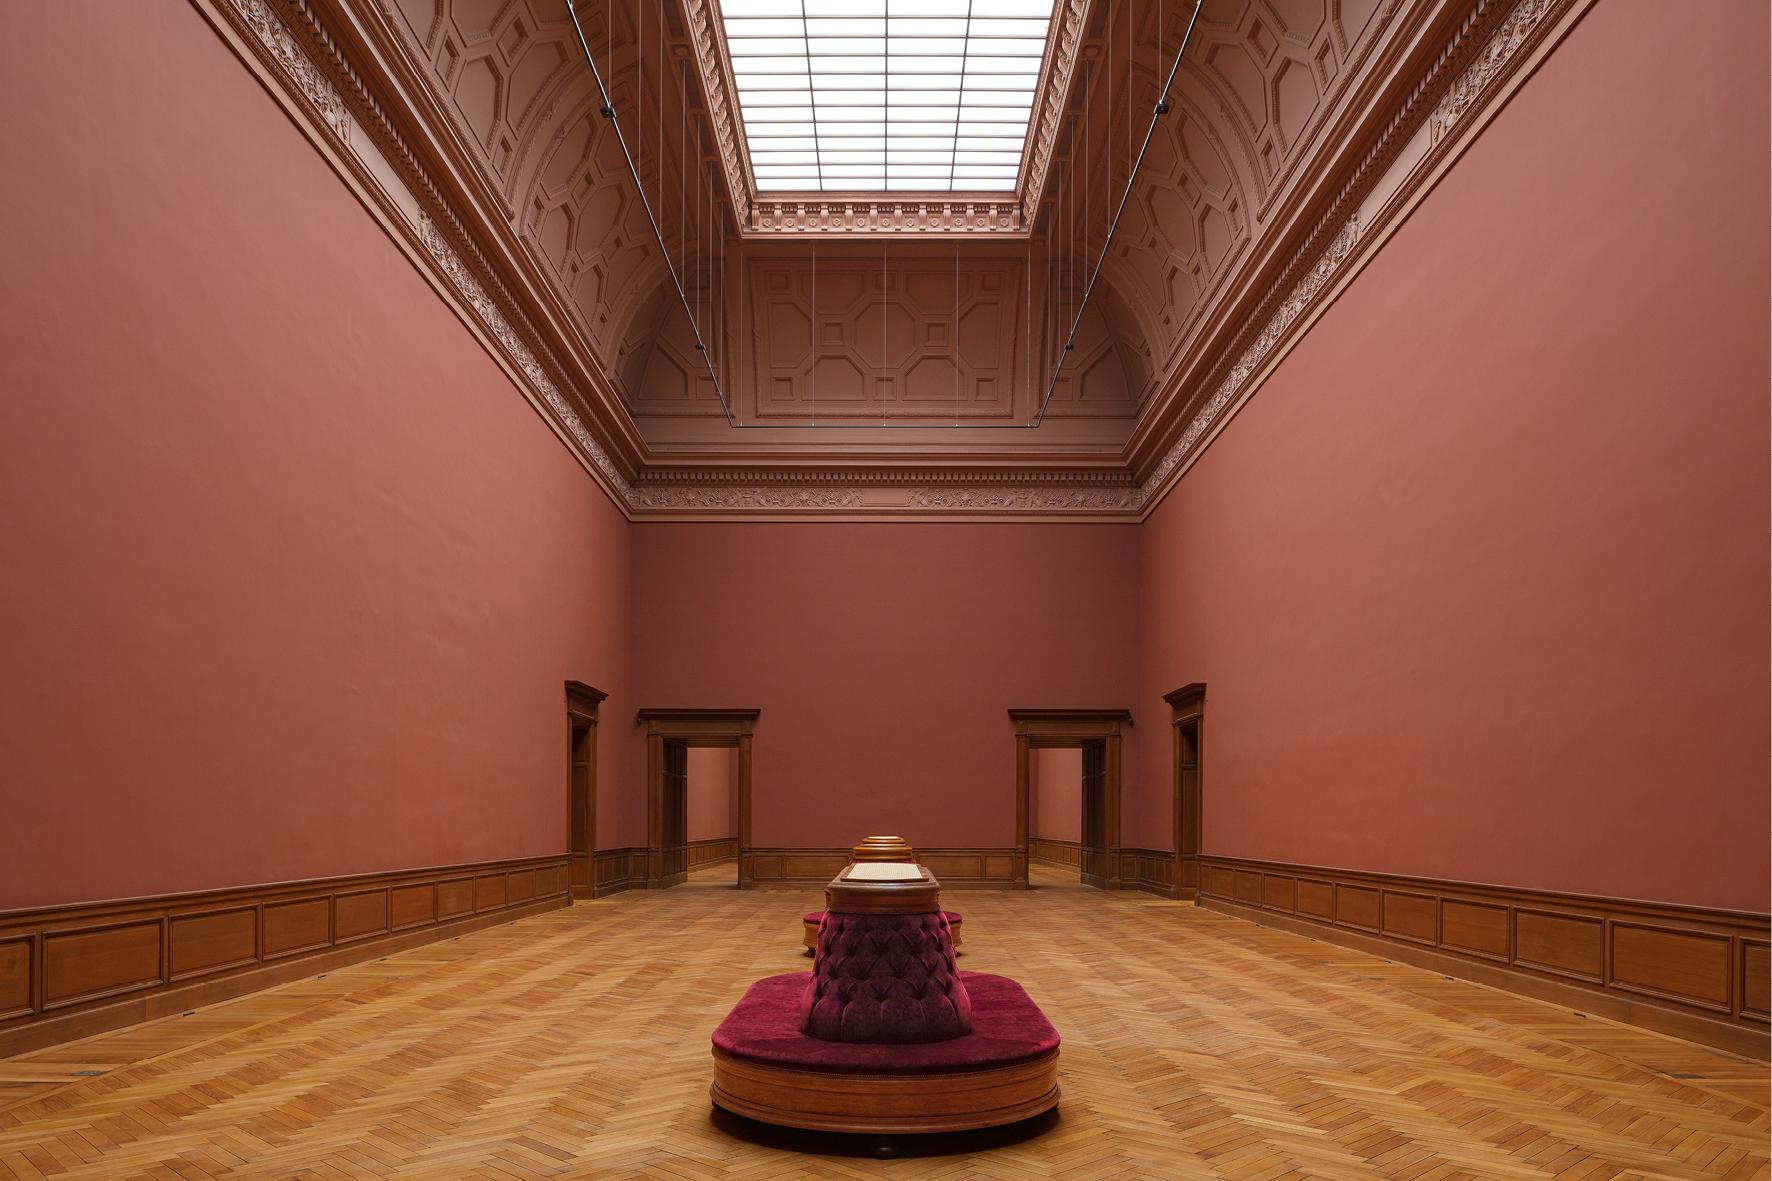 Royal Museum of Fine Arts (KMSKA)